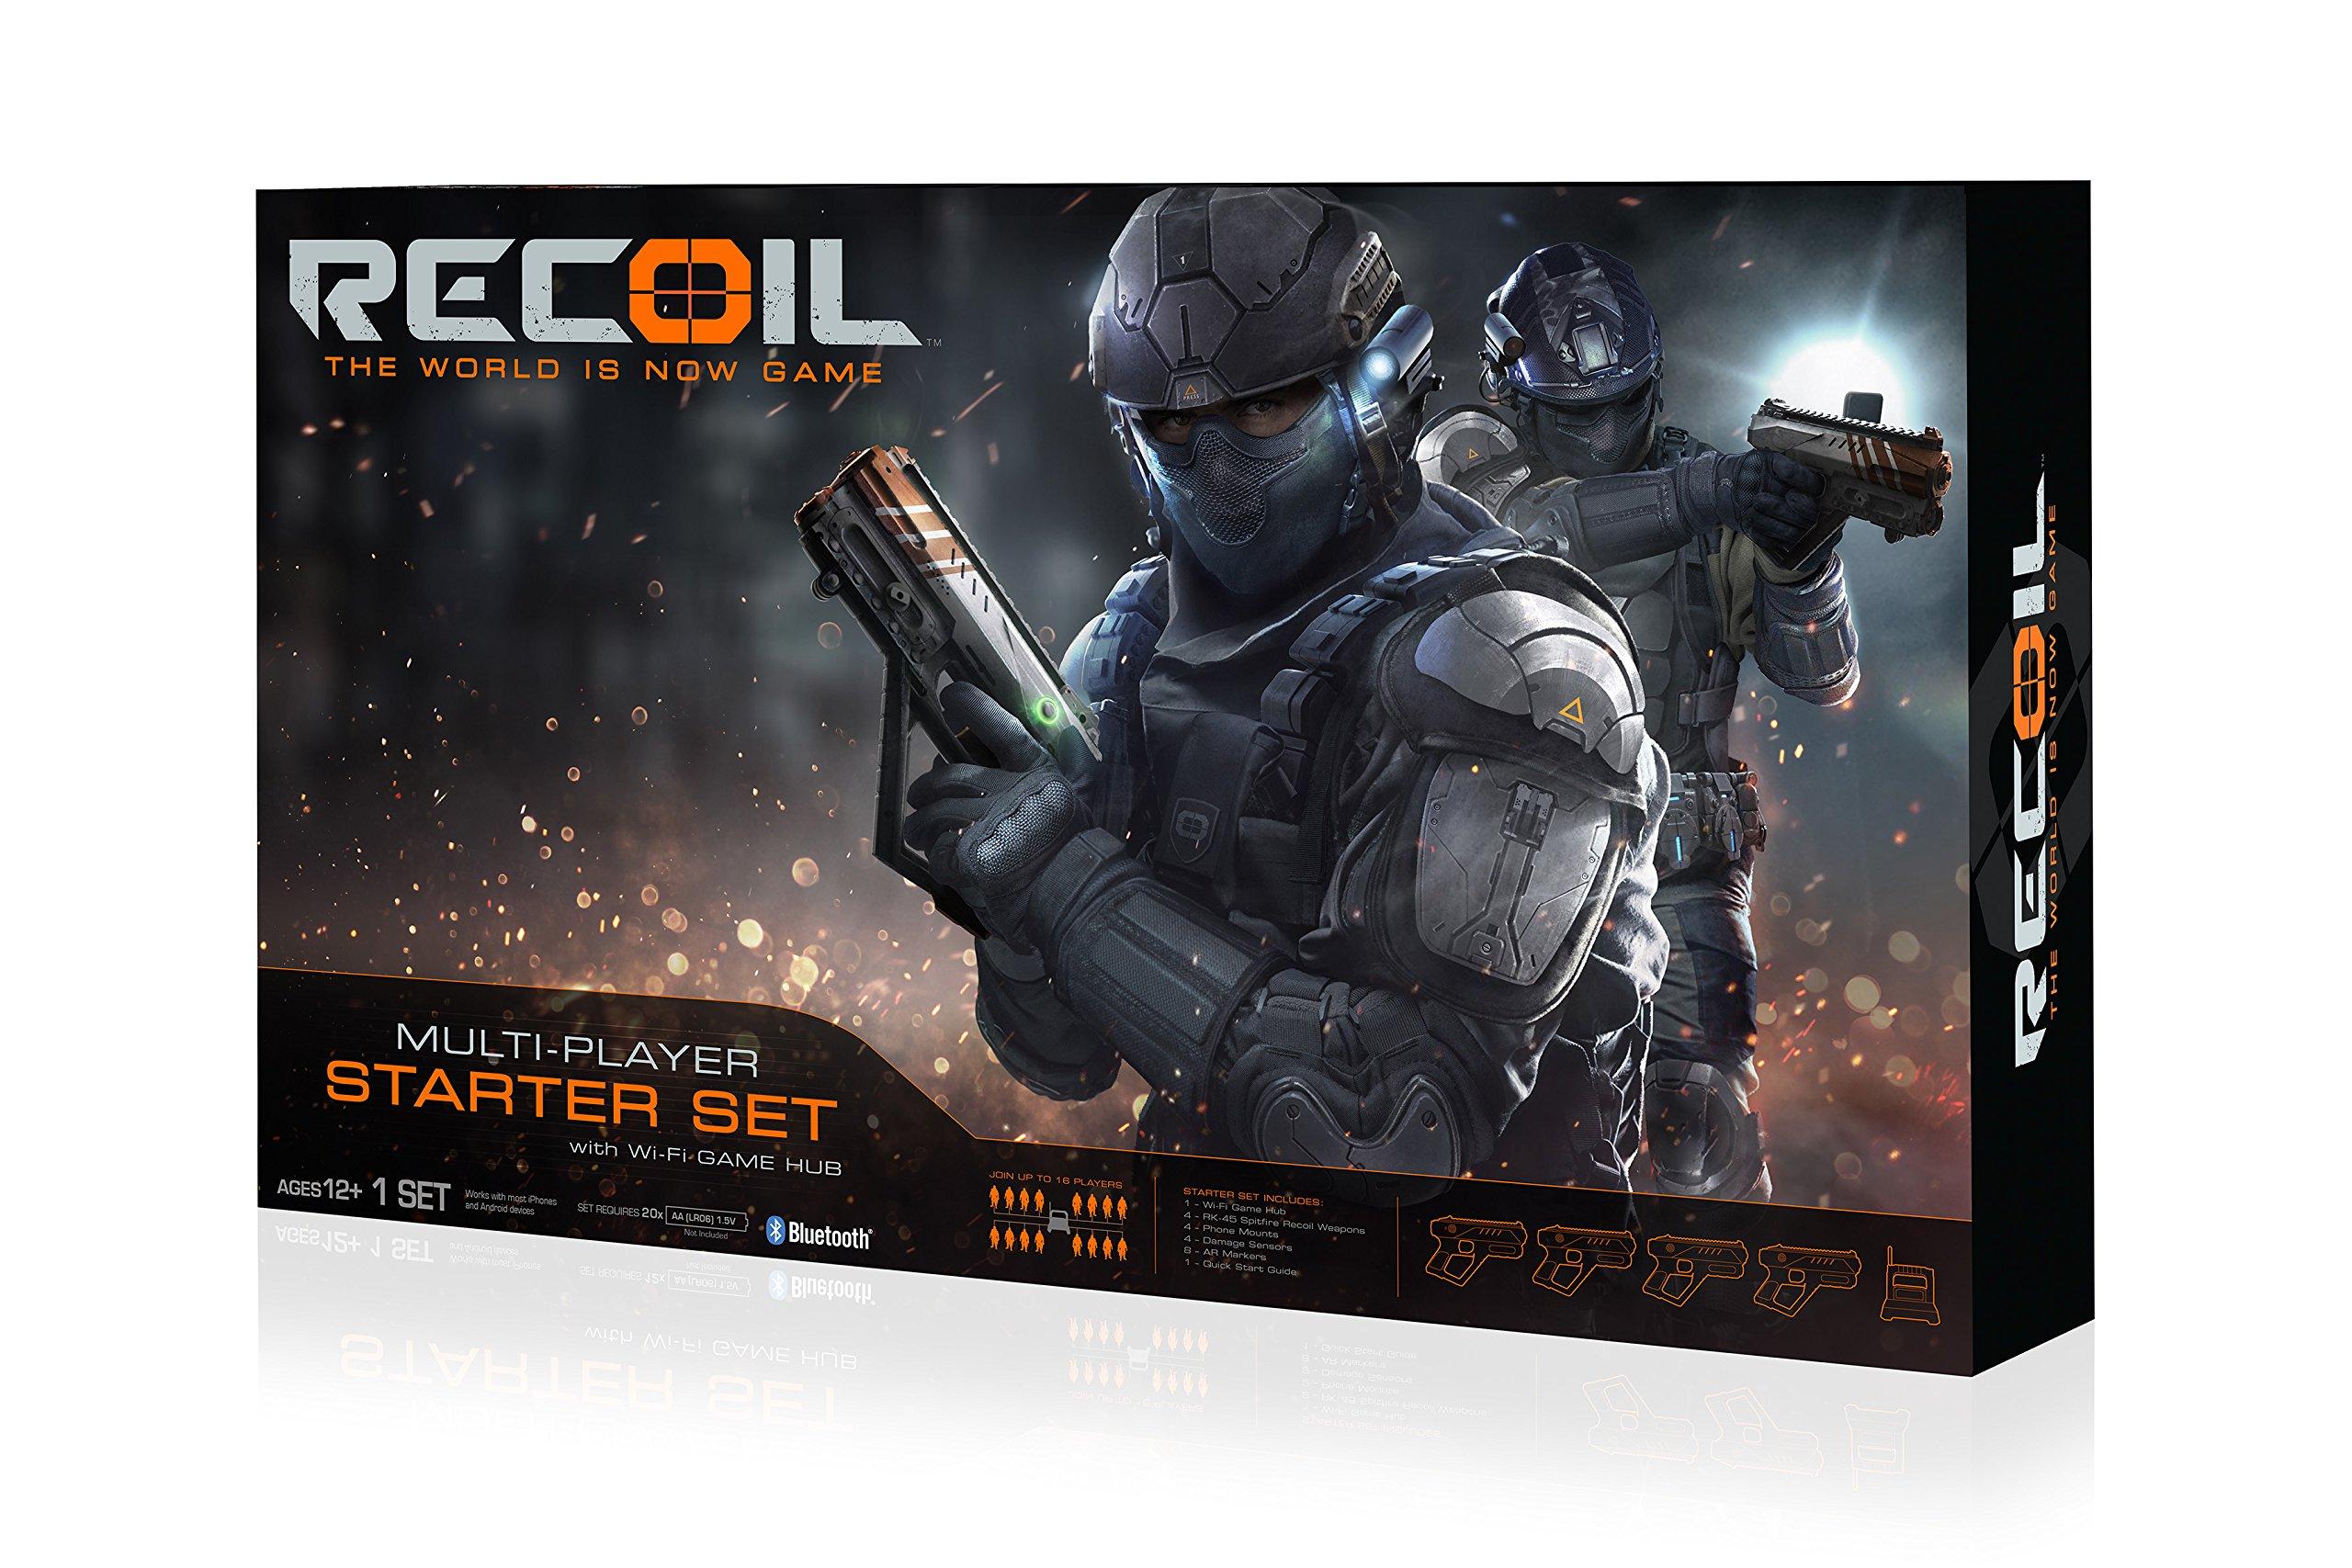 Recoil Laser Combat-4-Player Start Set Amazon Exclusive